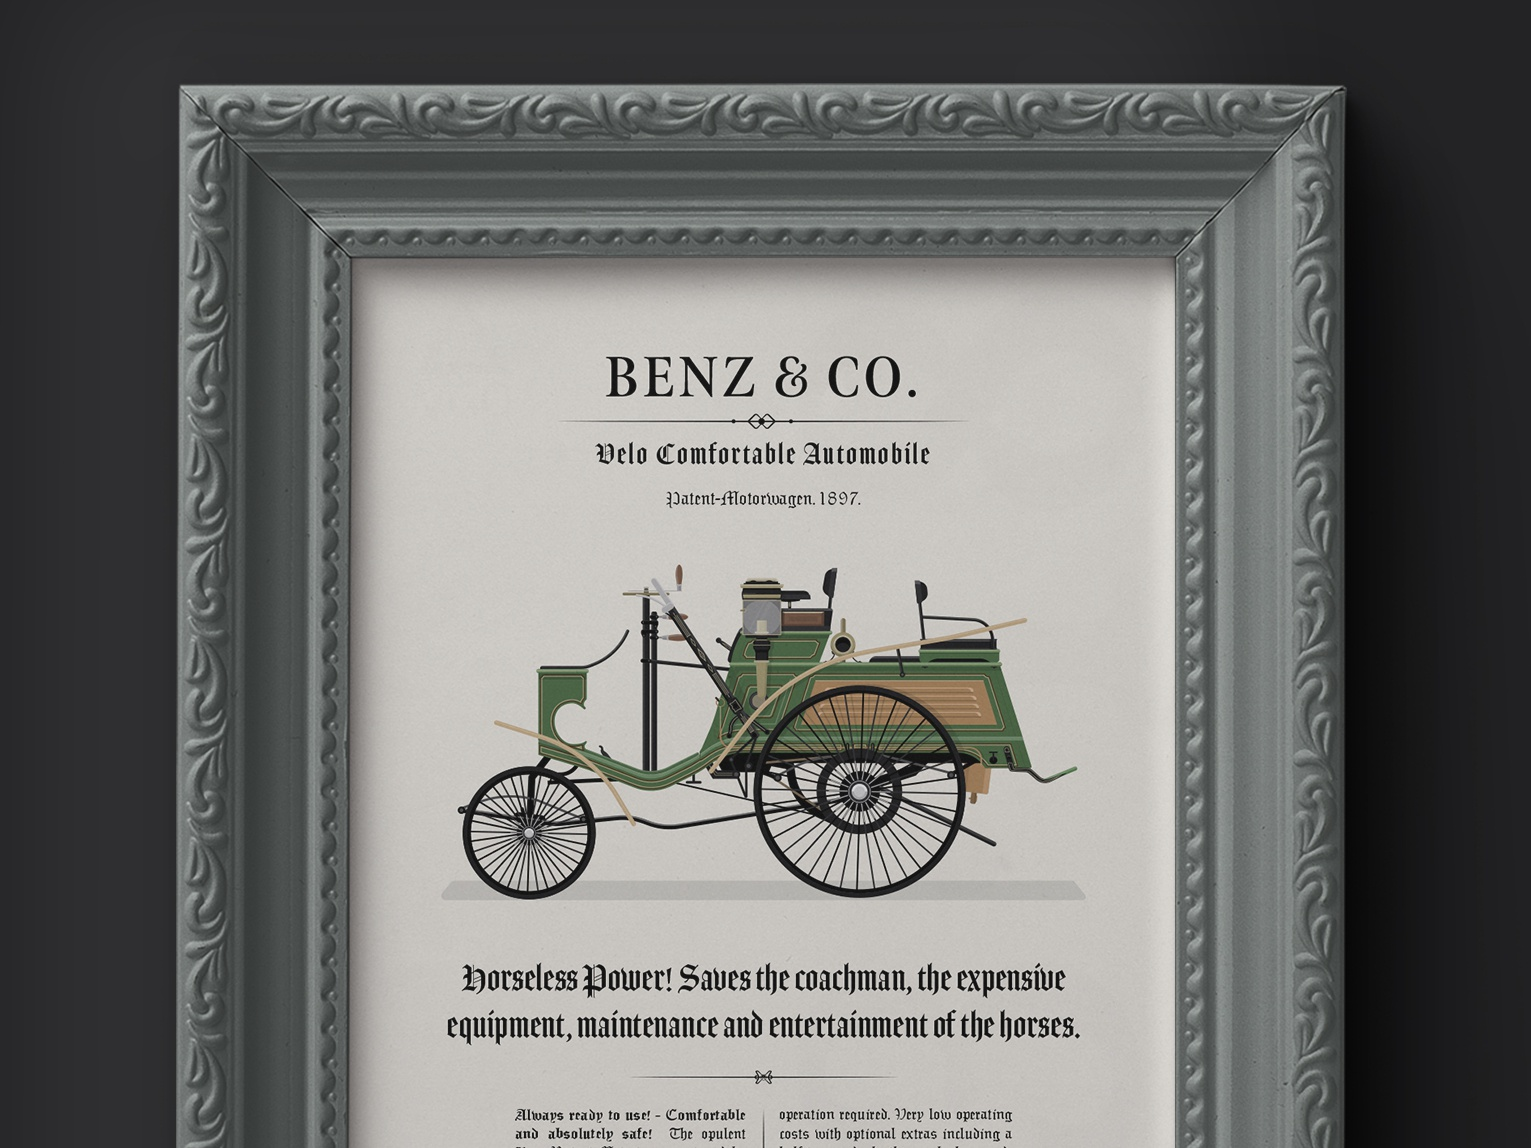 Dribbble benz velo comfortable car illustration frame mockup